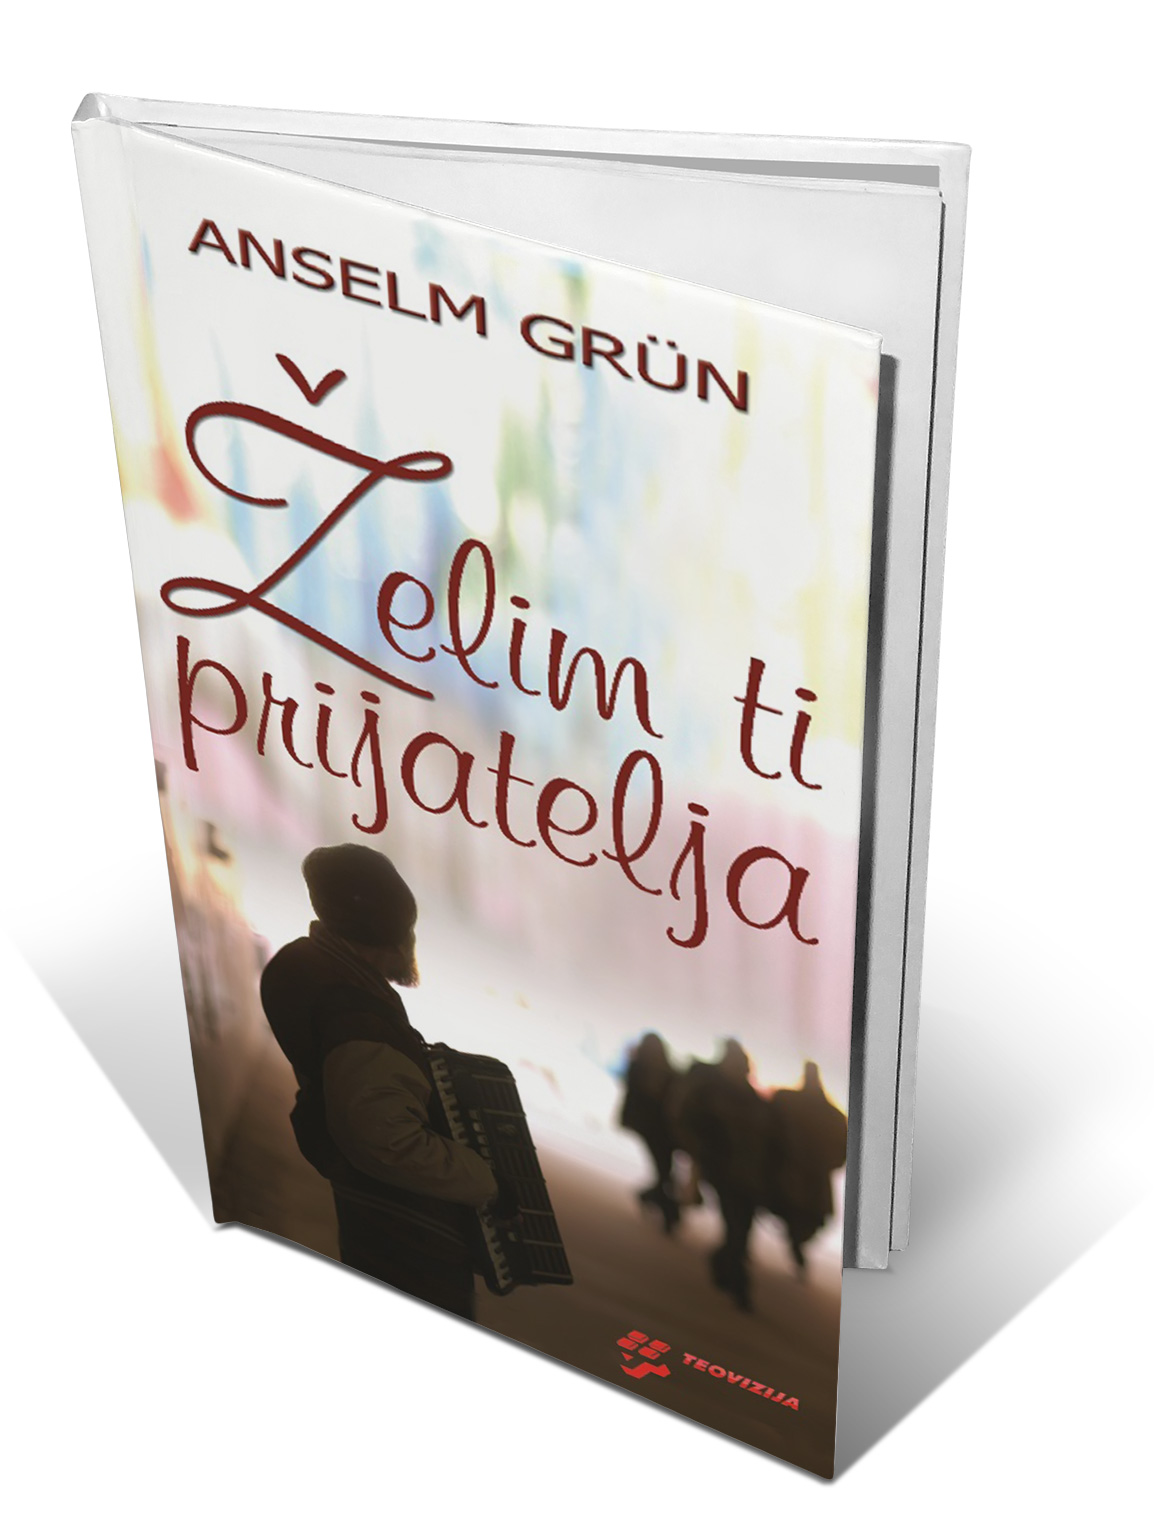 ŽELIM TI PRIJATELJA (tvrdi uvez) - Anselm Grün